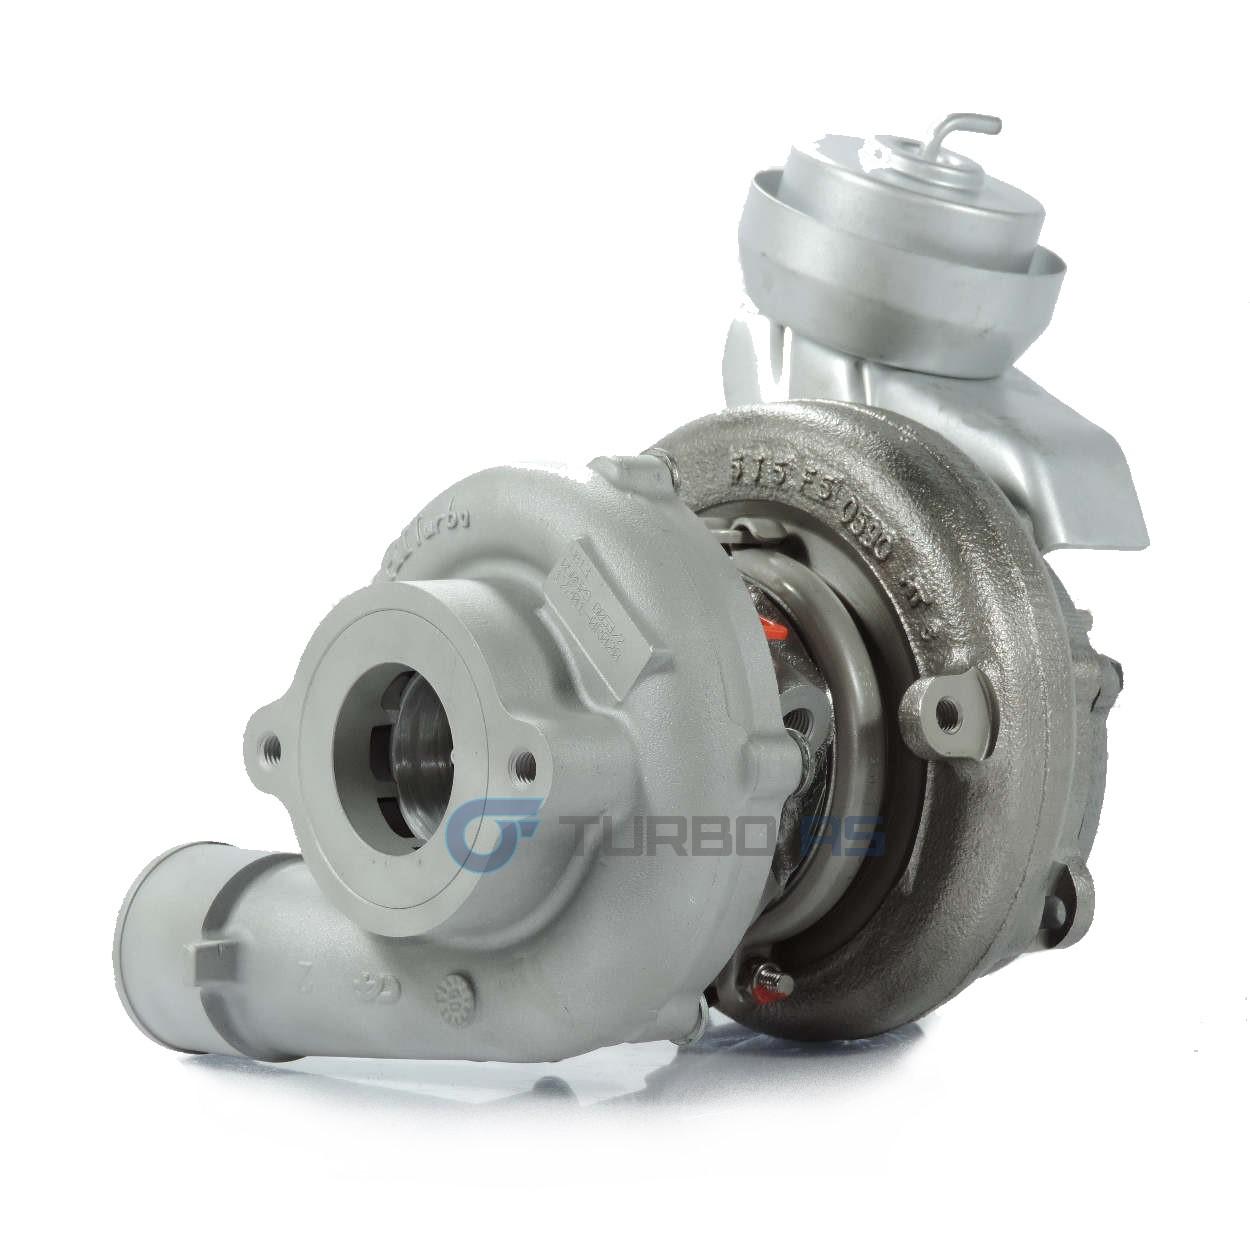 TurbosprężarkaVB13 - TURBO AS